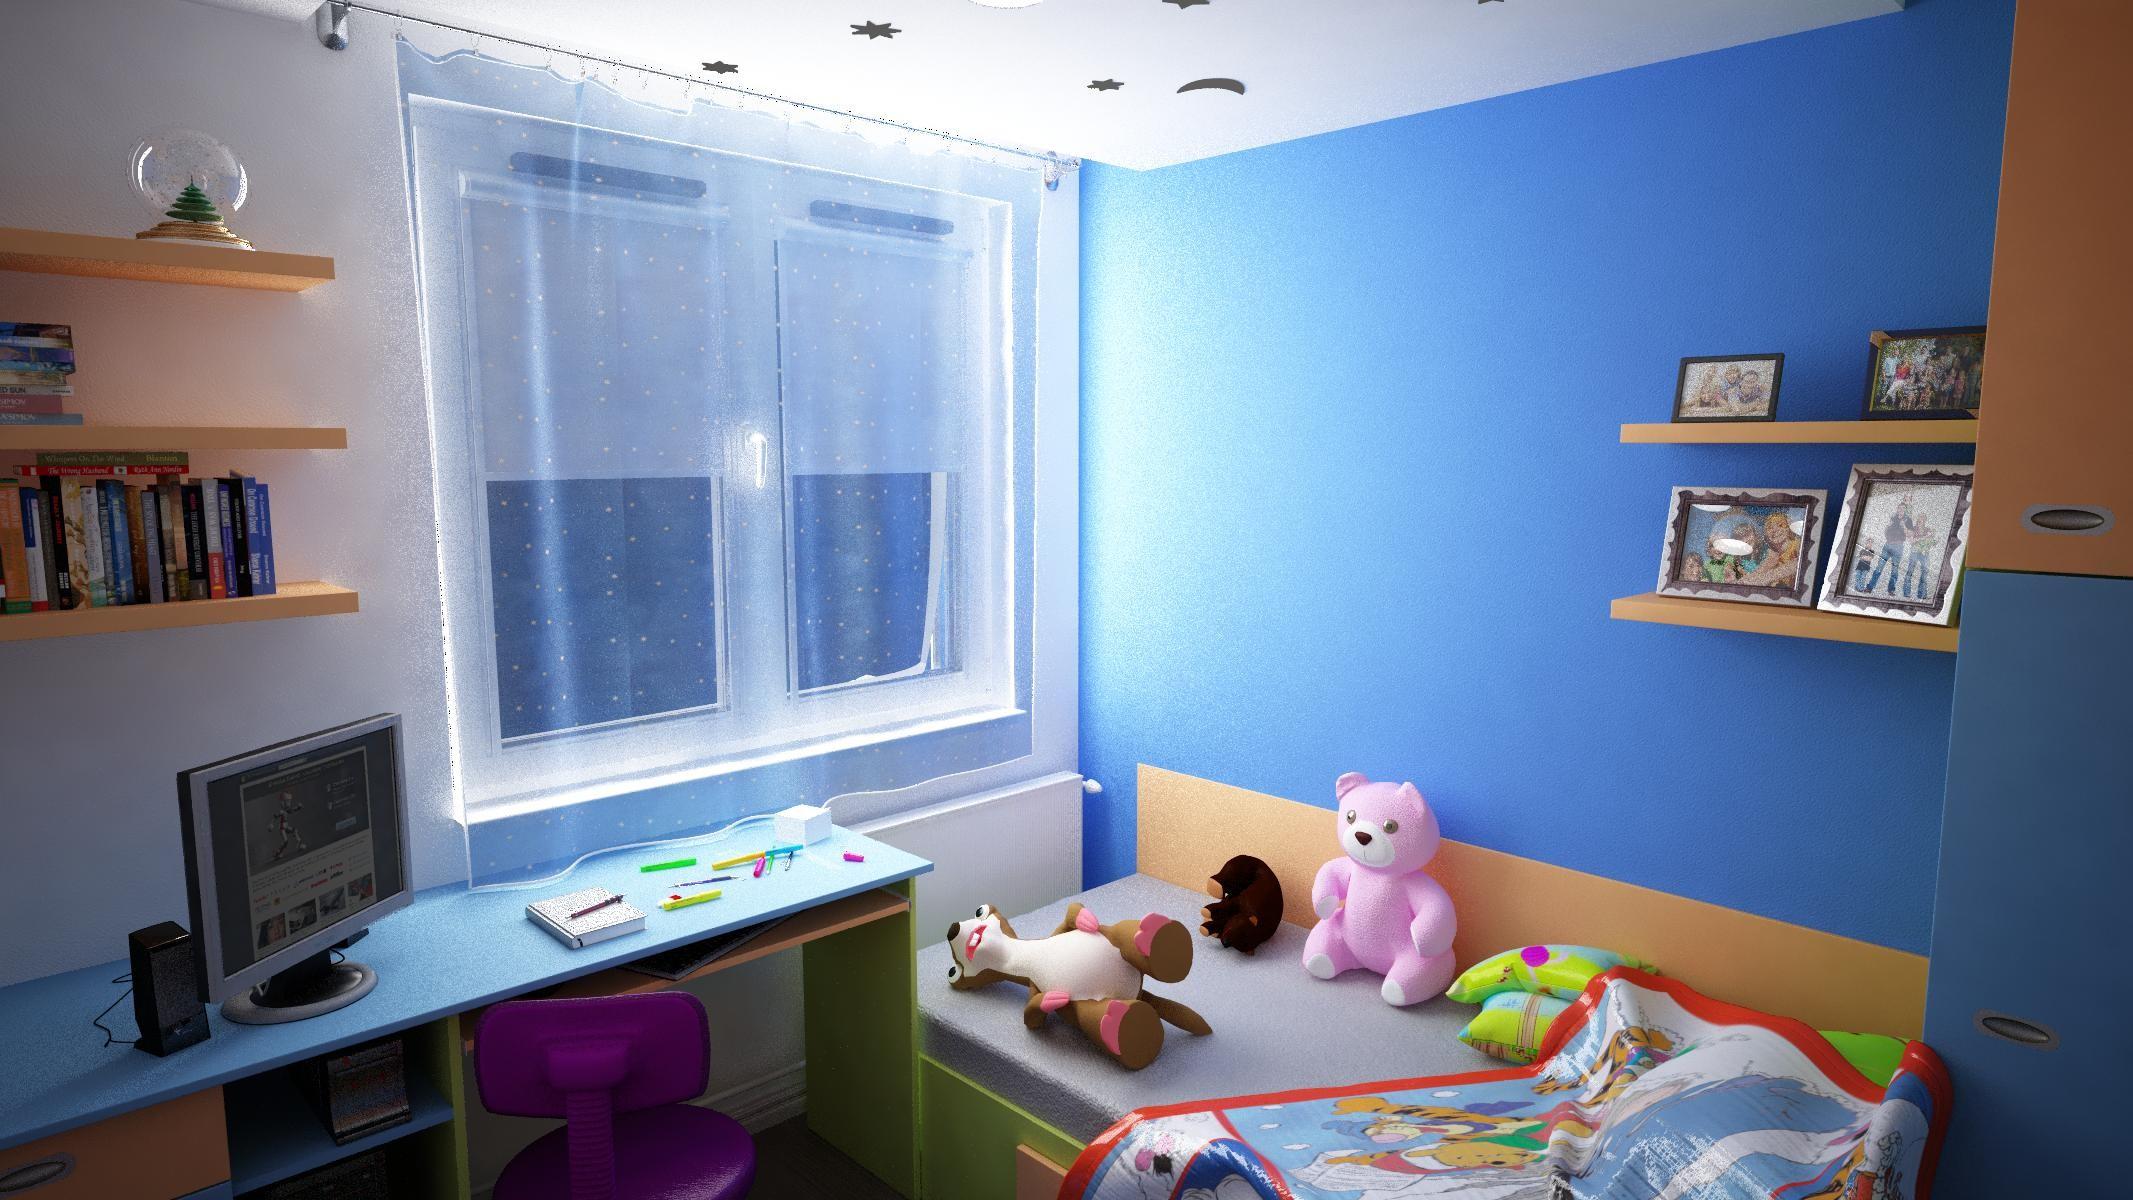 render_apartment_1_v-ray_6_Kidroom_10001.jpg